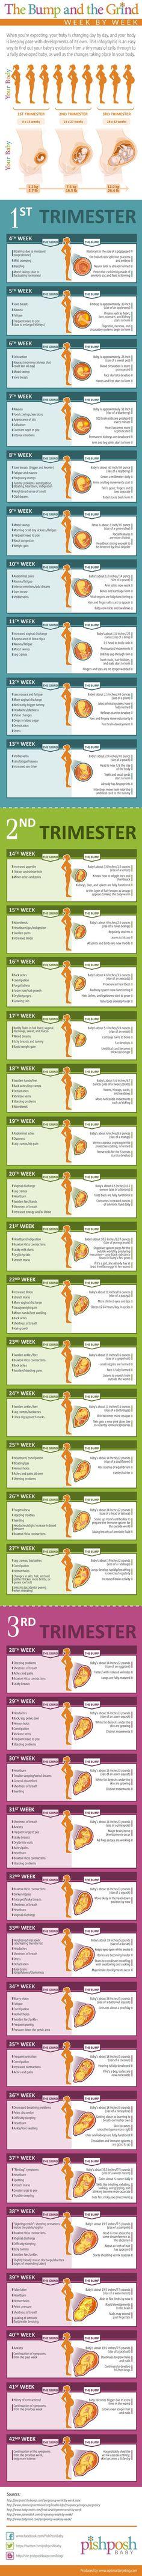 Pregnancy Week by Week Chart - Fun - - Schwanger - Pregnant Tips Pregnancy Chart, Pregnancy Info, Pregnancy Health, Pregnancy Weeks, Pregnancy Timeline, Pregnancy Stages, Pregnancy Trimester Chart, Pregnancy Facts, Pregnancy Pictures